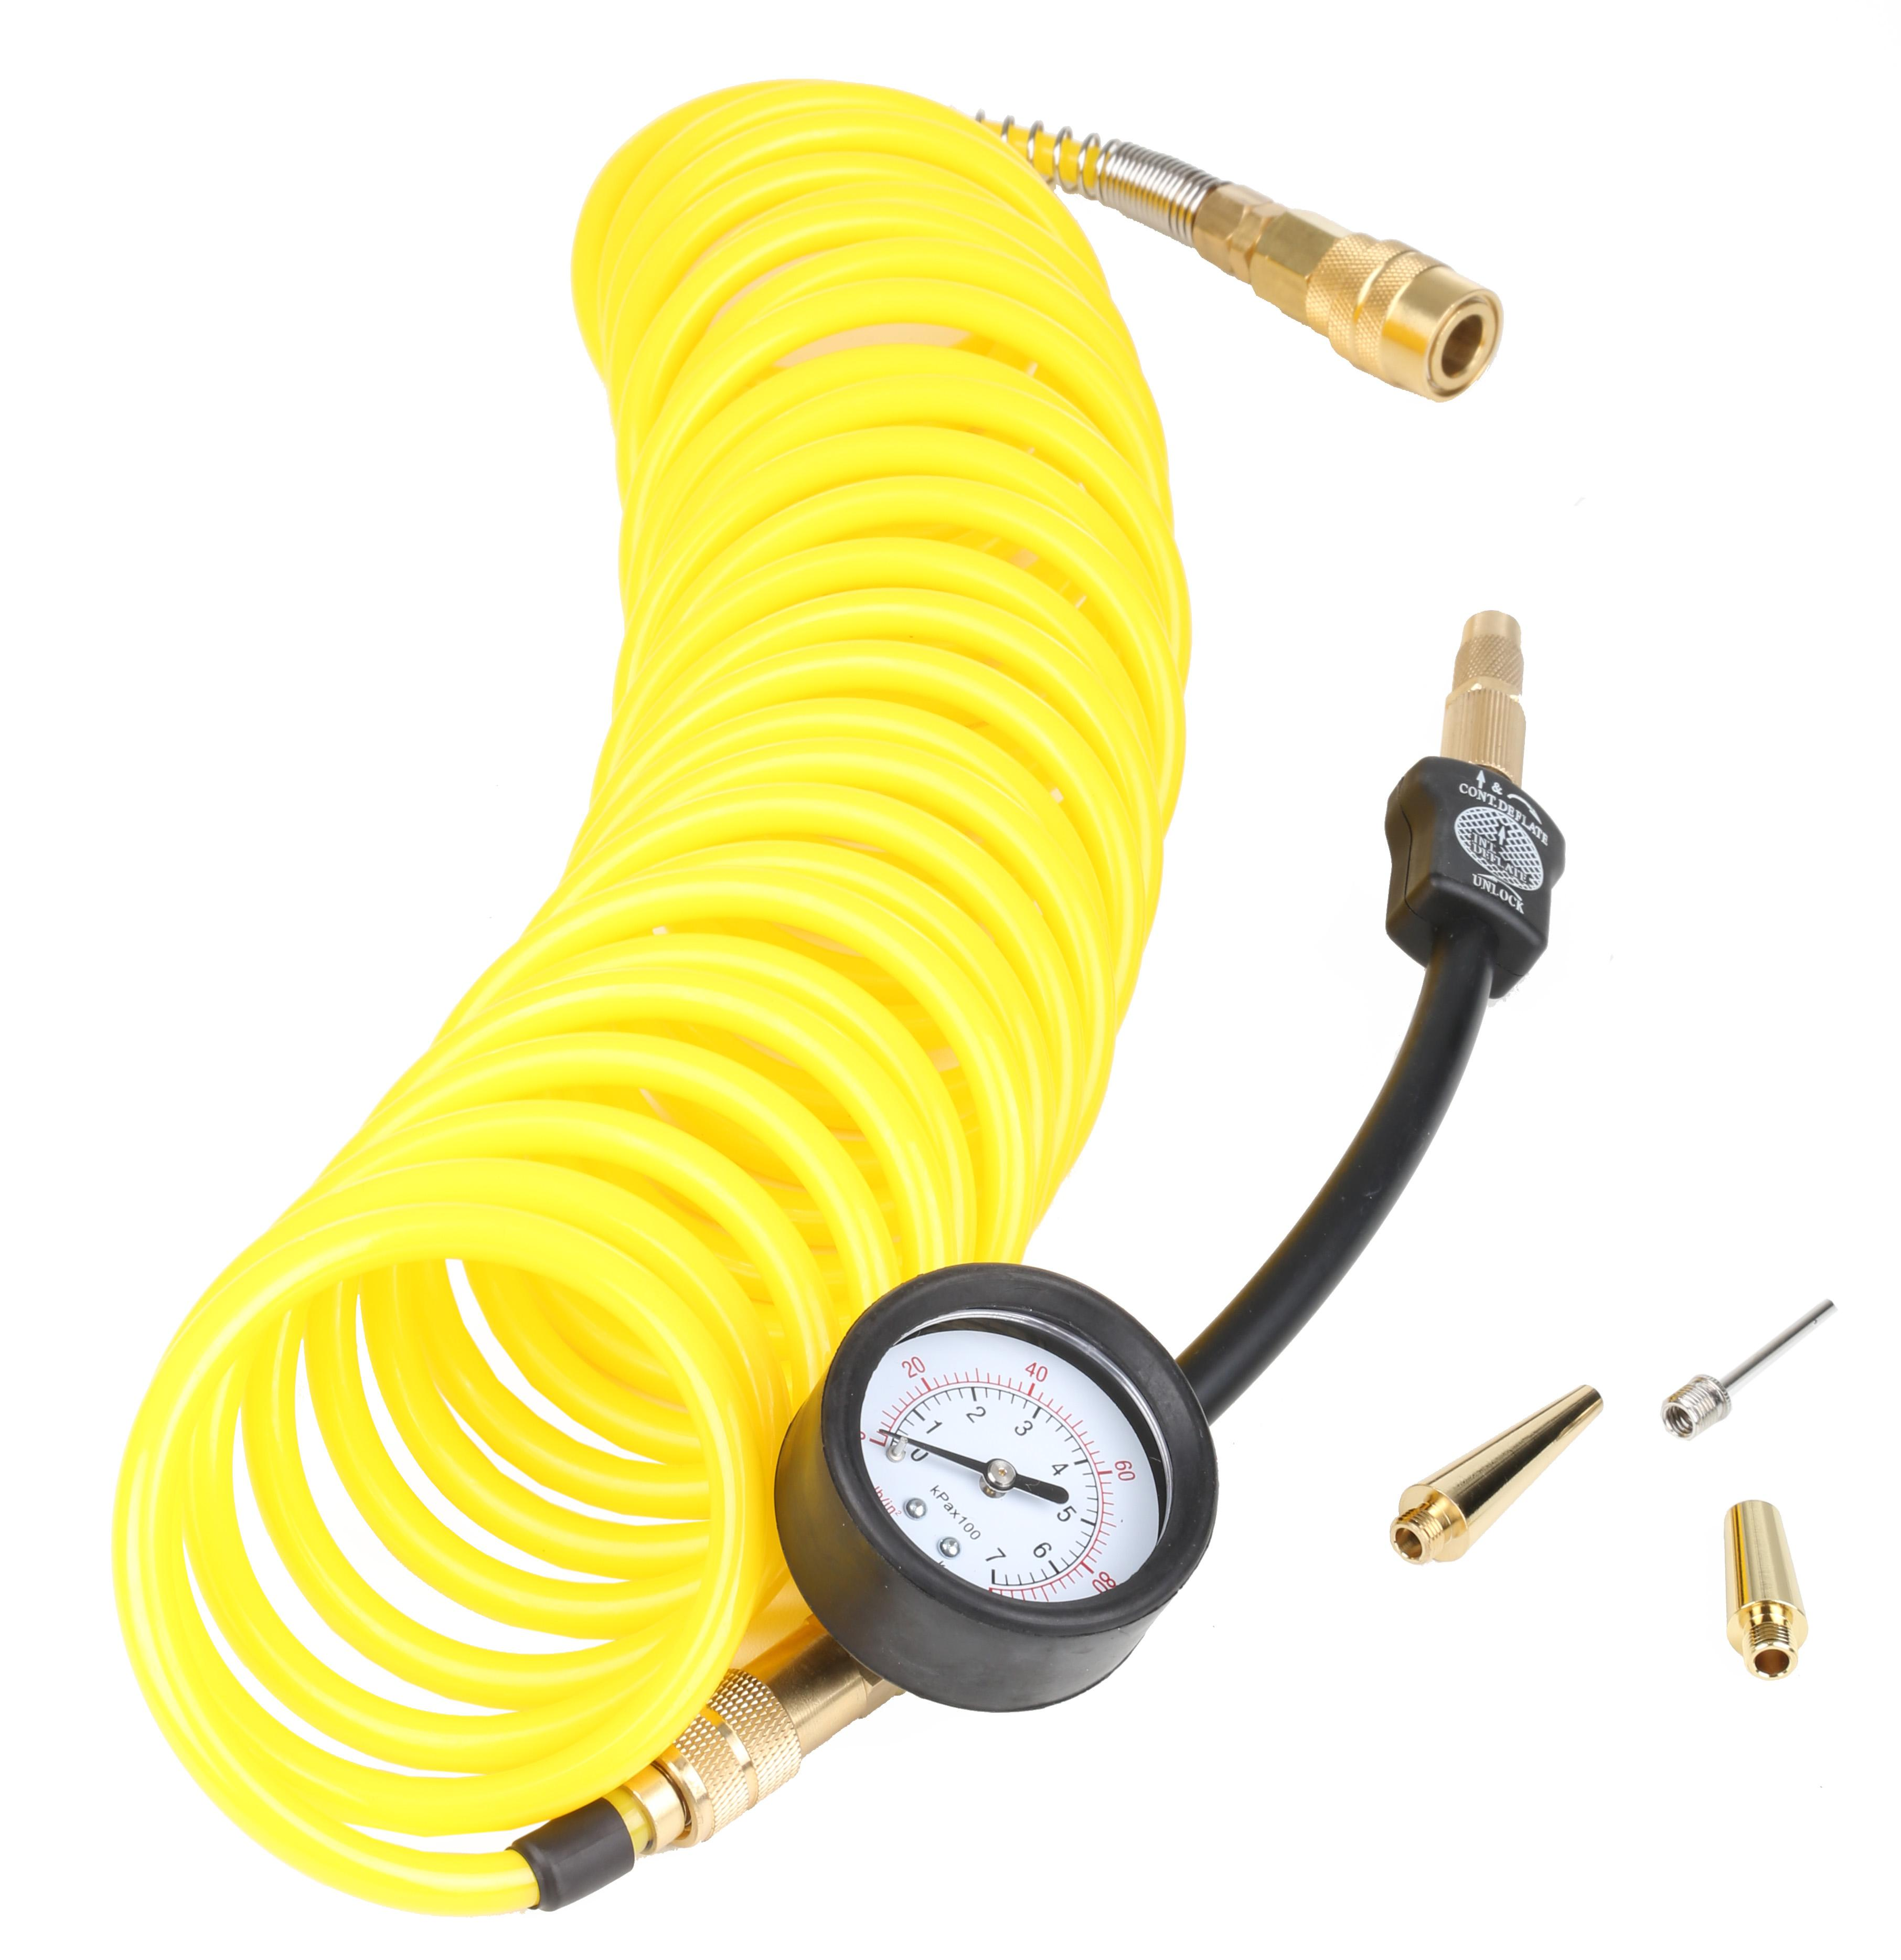 ring heavy duty portable air compressor 12v 100psi tyre. Black Bedroom Furniture Sets. Home Design Ideas